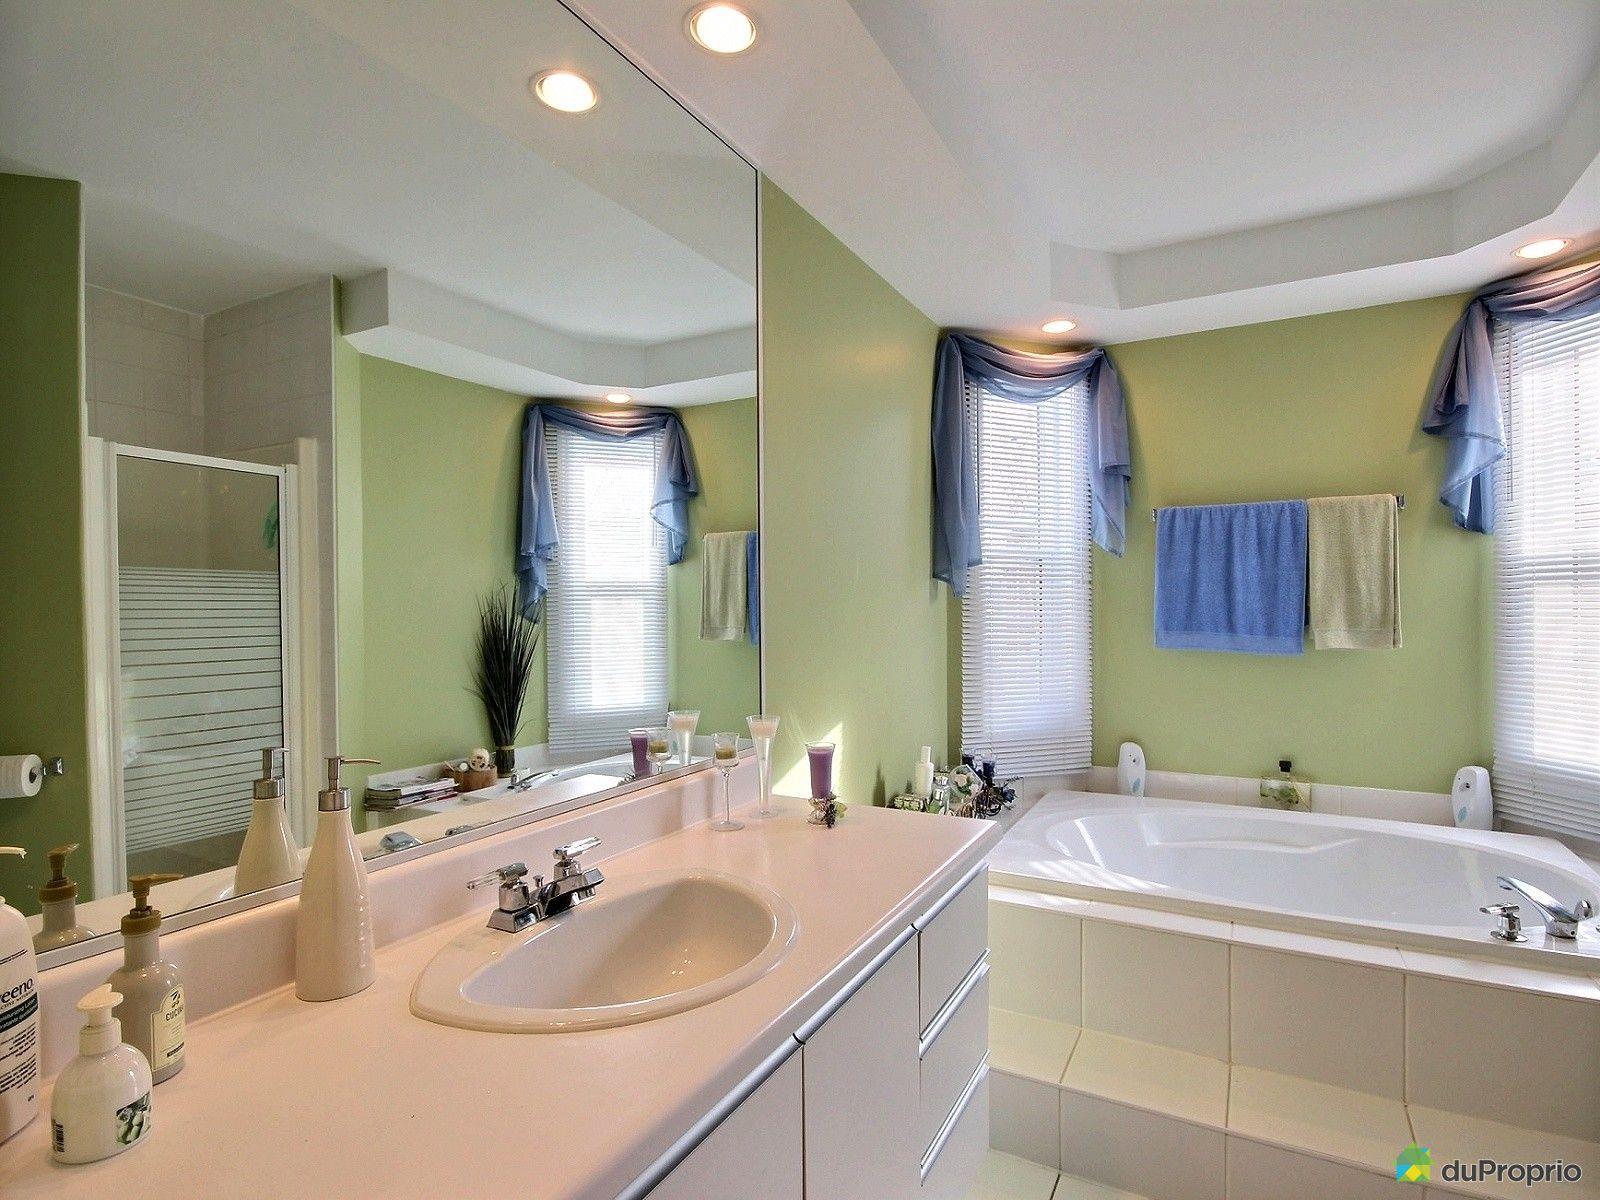 maison vendu mercier immobilier qu bec duproprio 563995. Black Bedroom Furniture Sets. Home Design Ideas